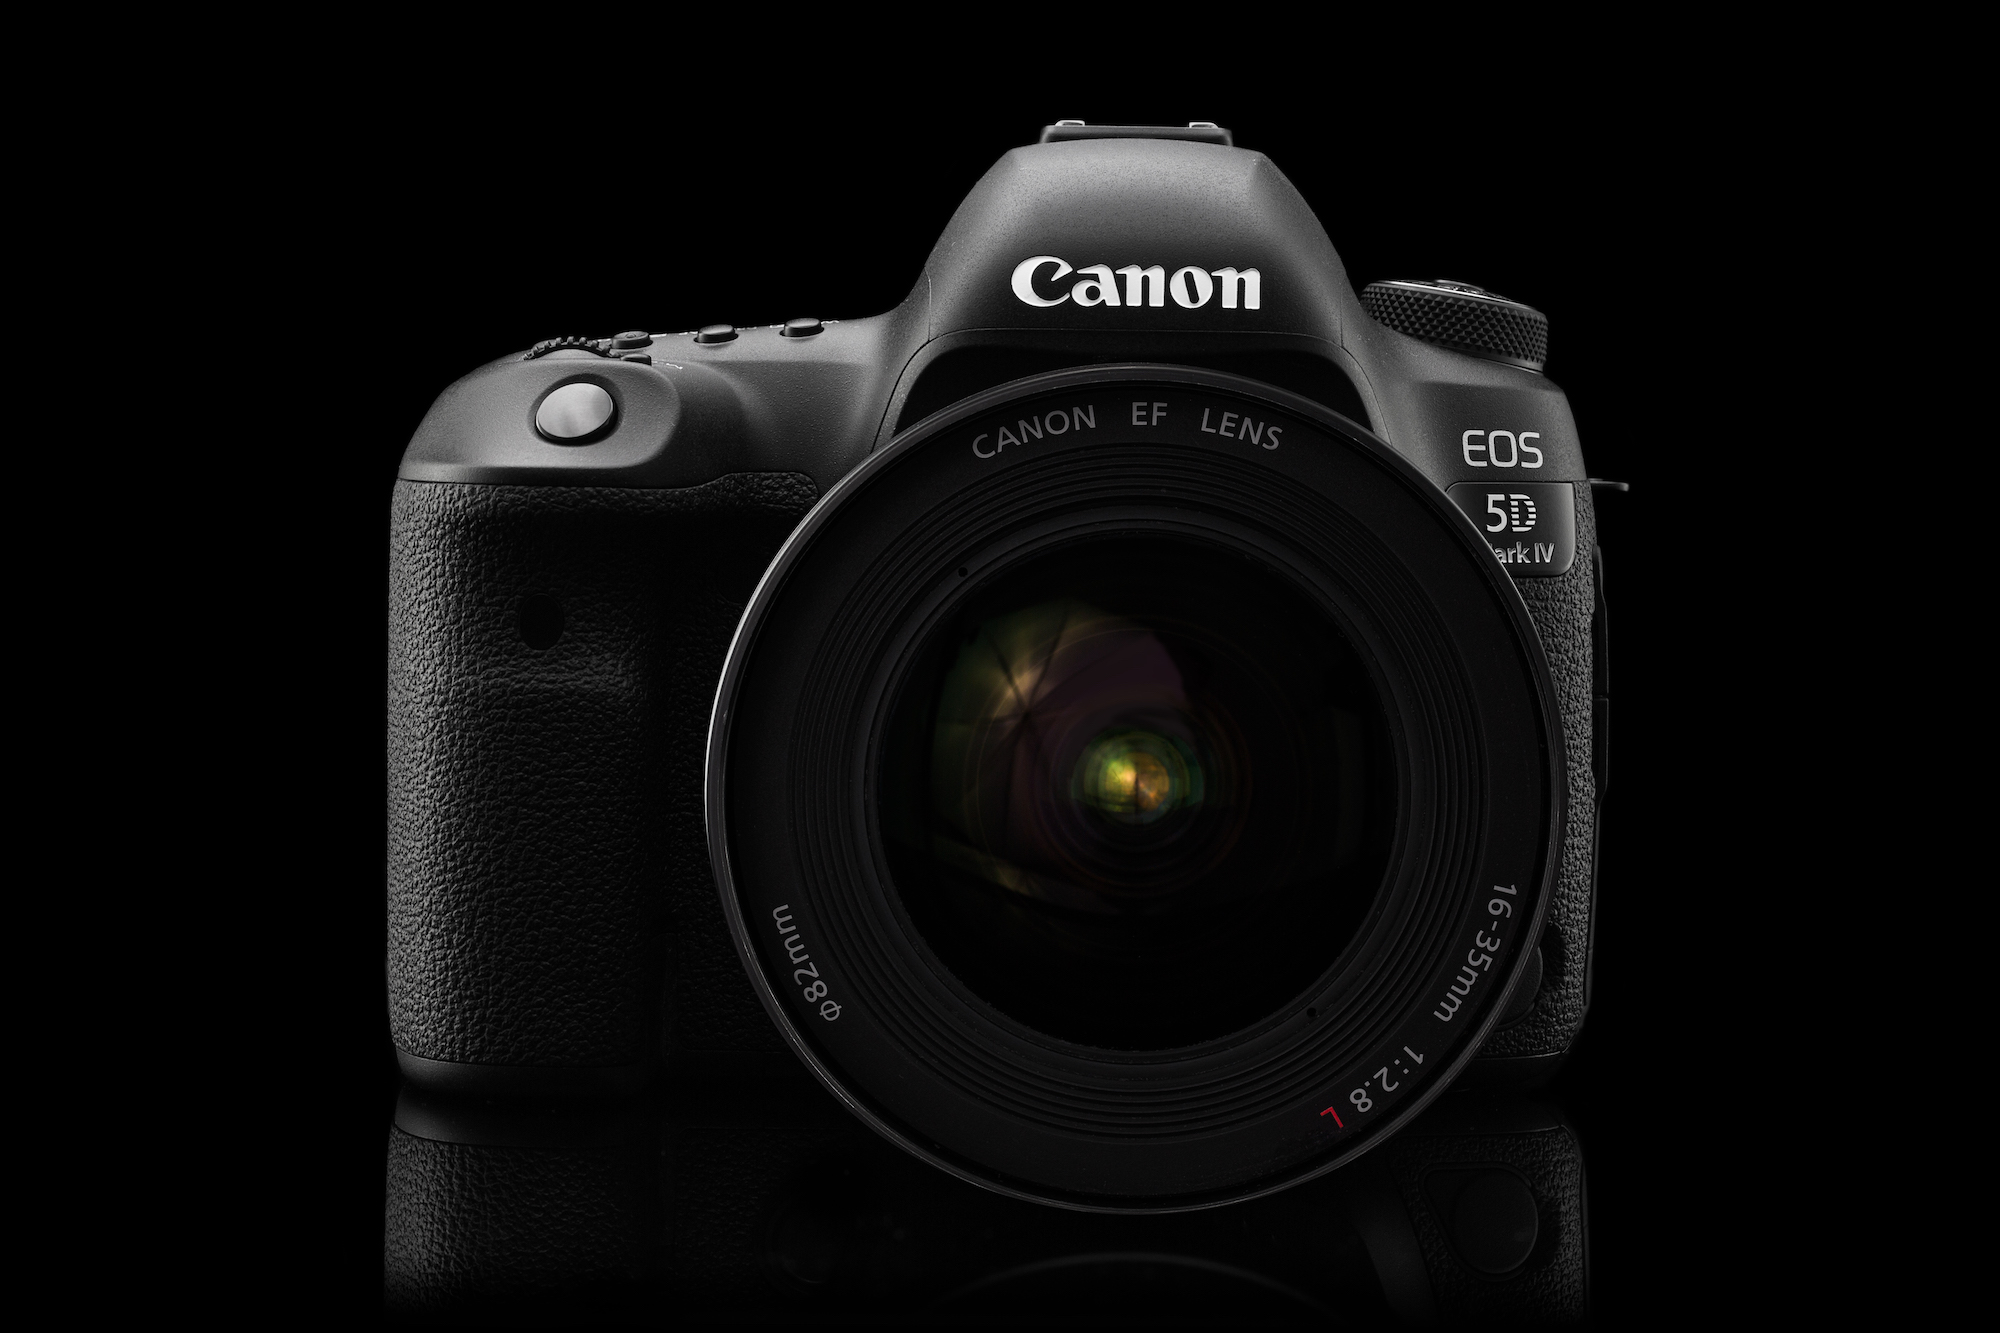 Studio shot of a Canon DSLR camera